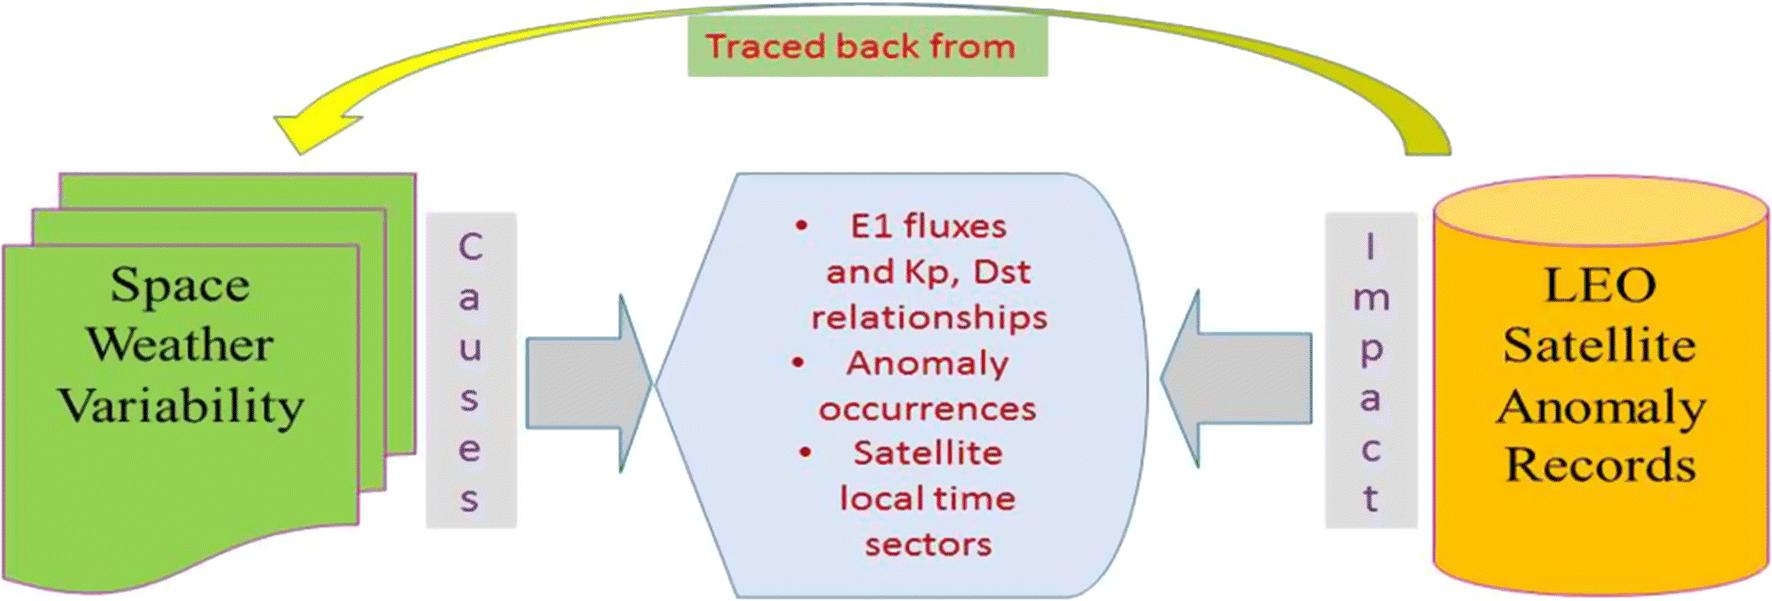 Diagnosing low earth orbit satellite anomalies using NOAA-15